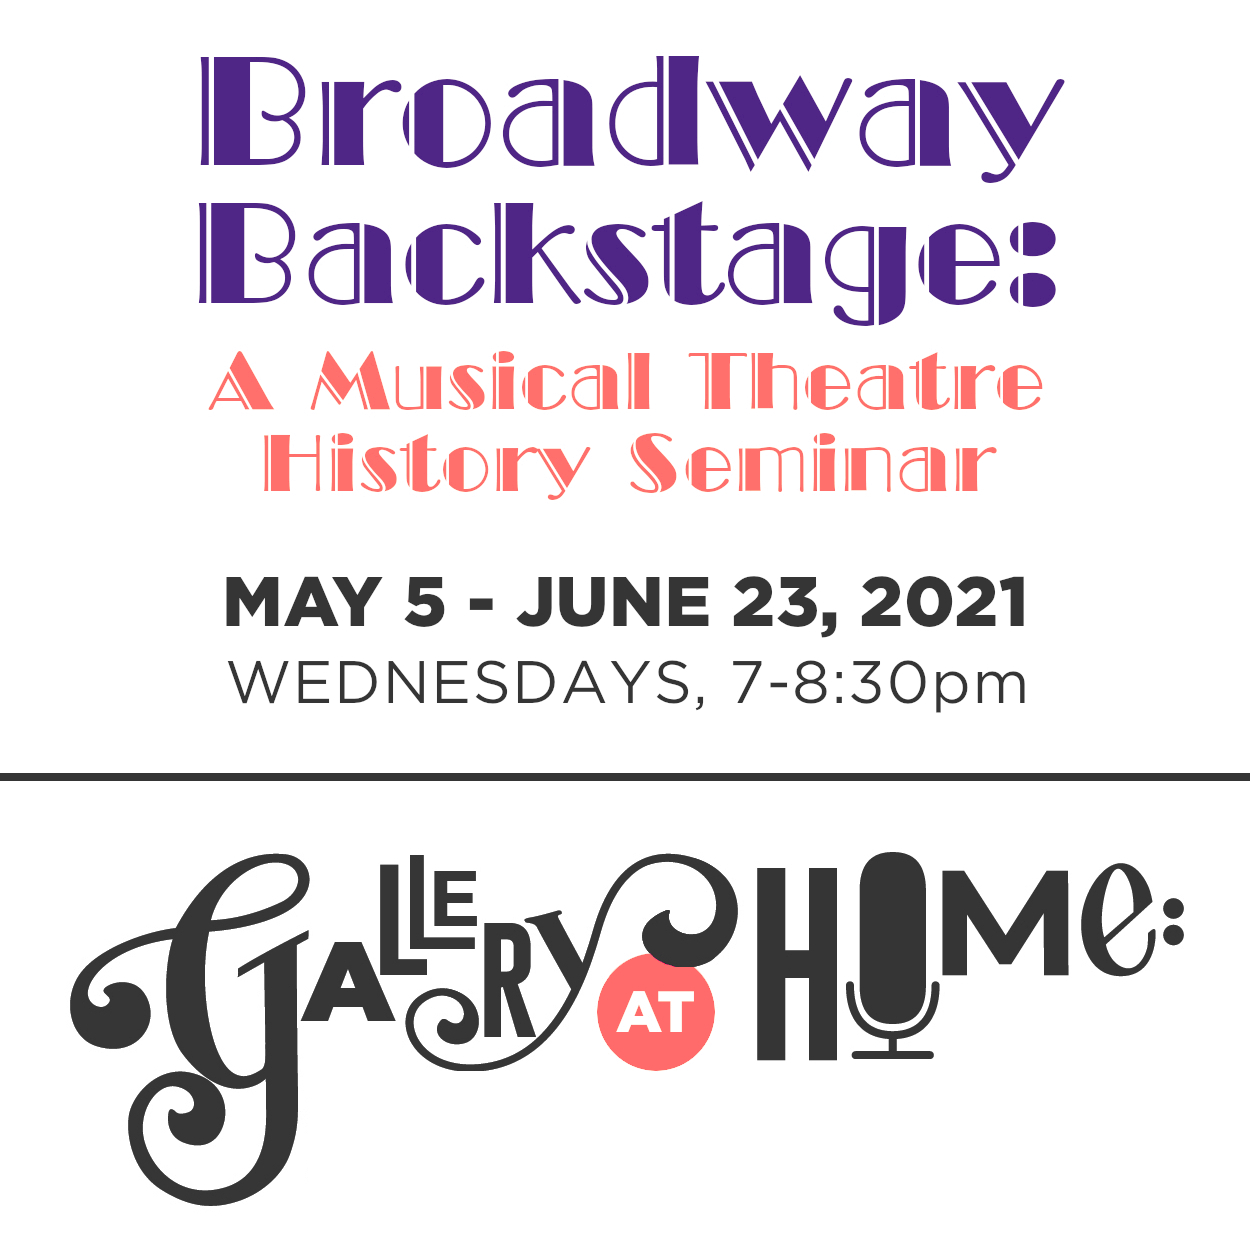 Broadway Backstage